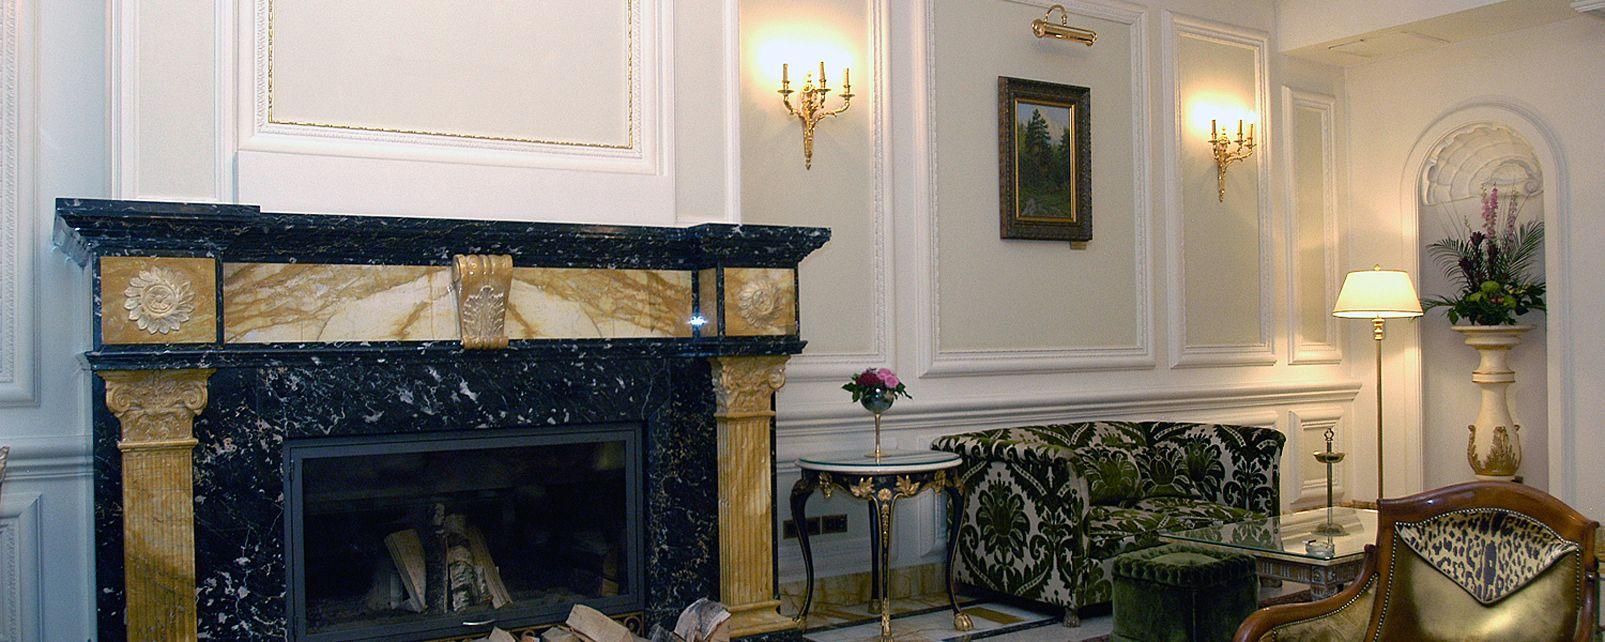 Hôtel Savoy Moscow